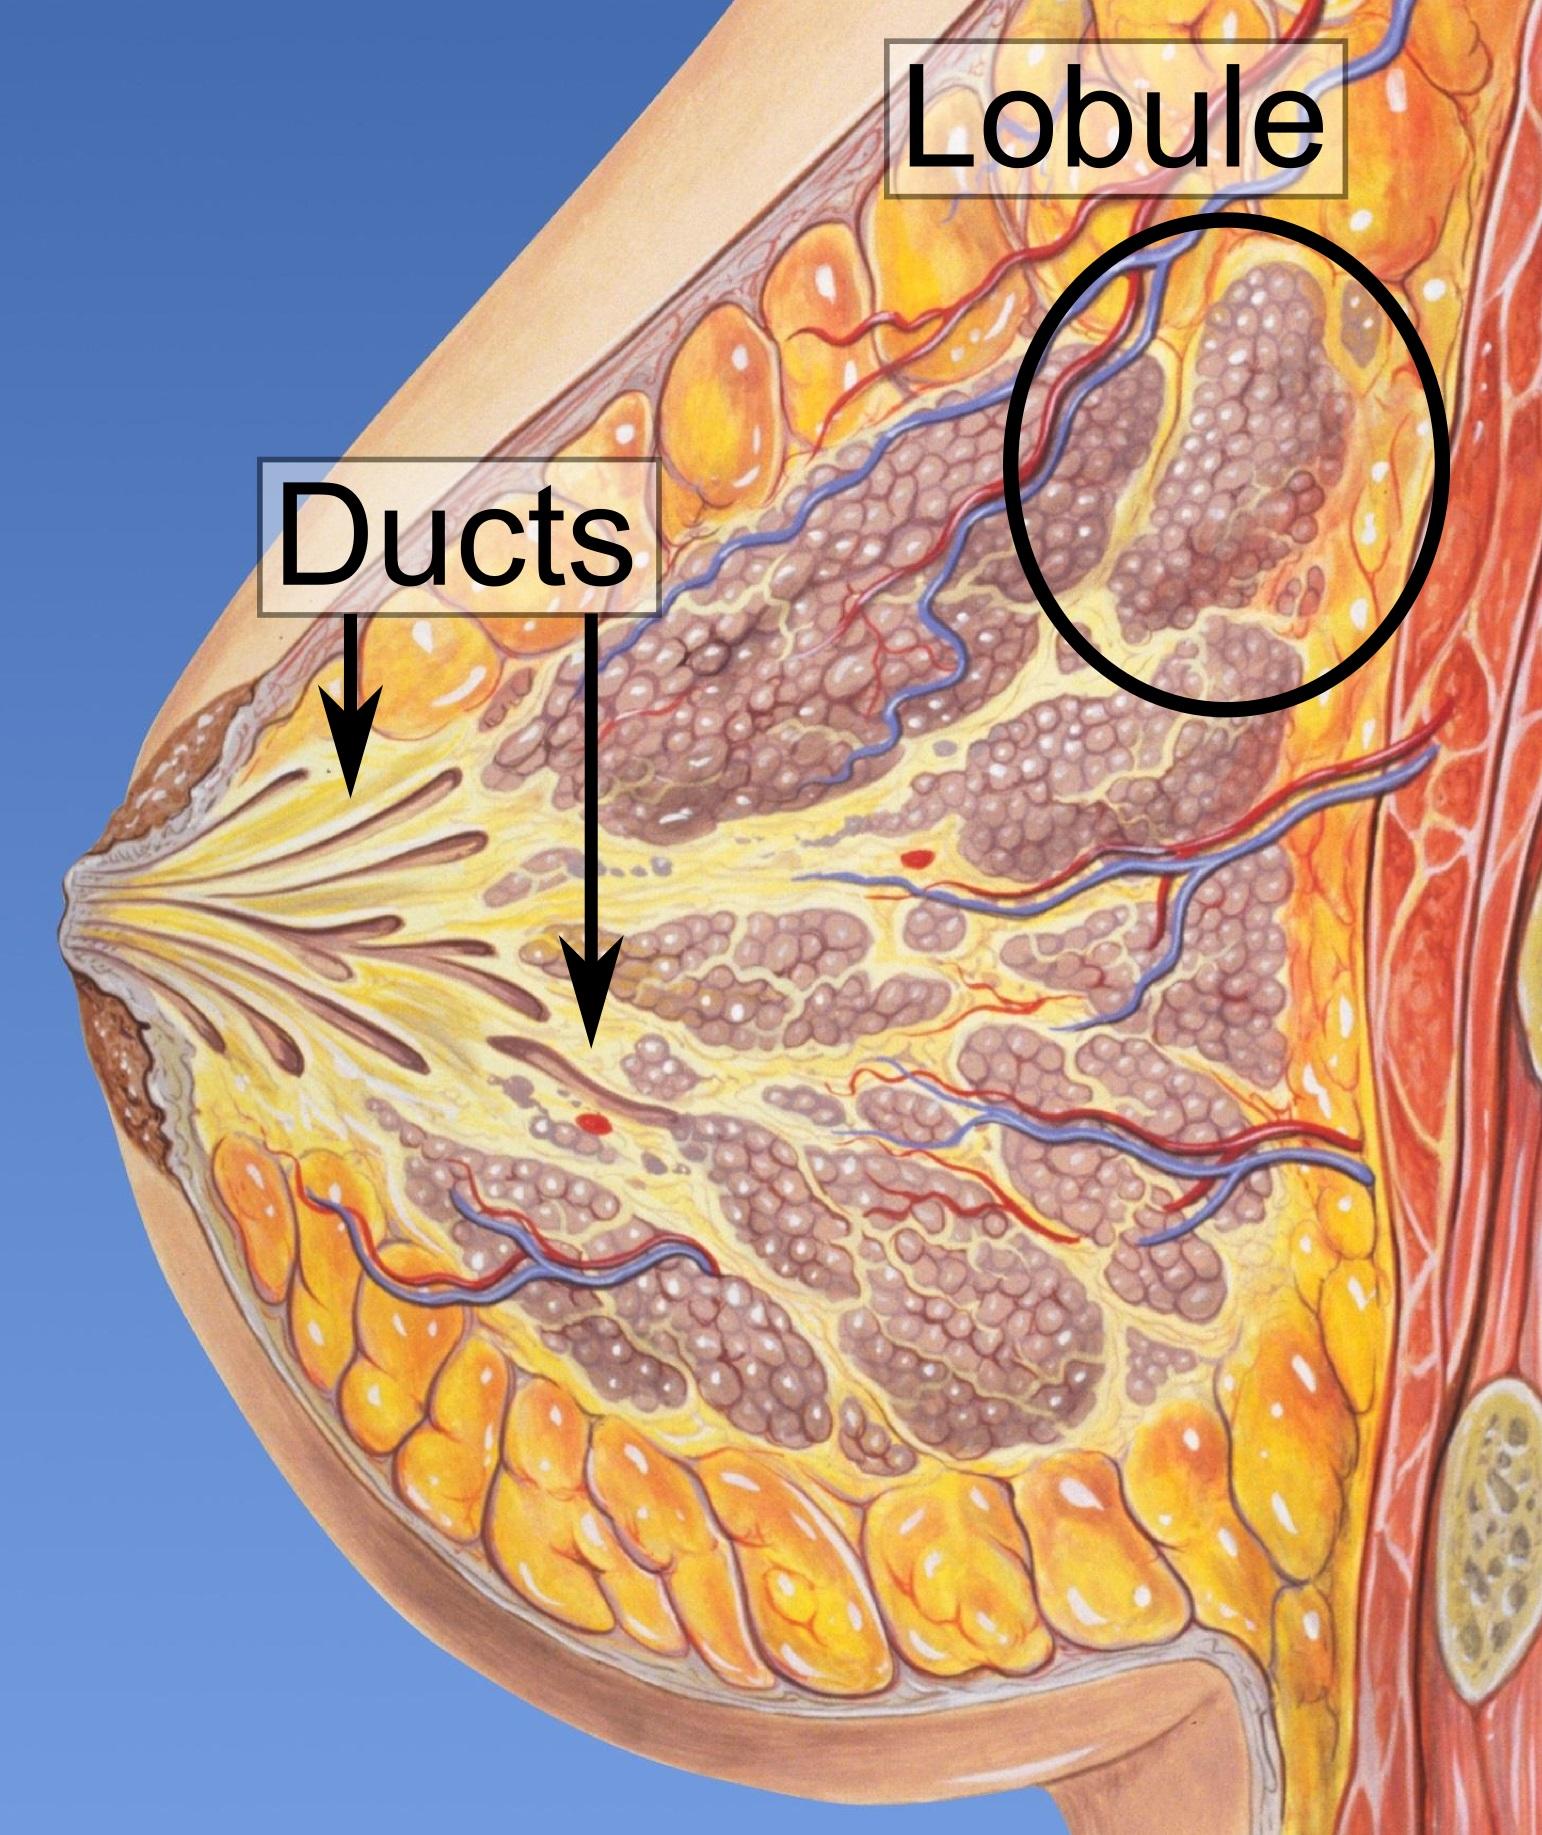 papilloma of breast icd 10)